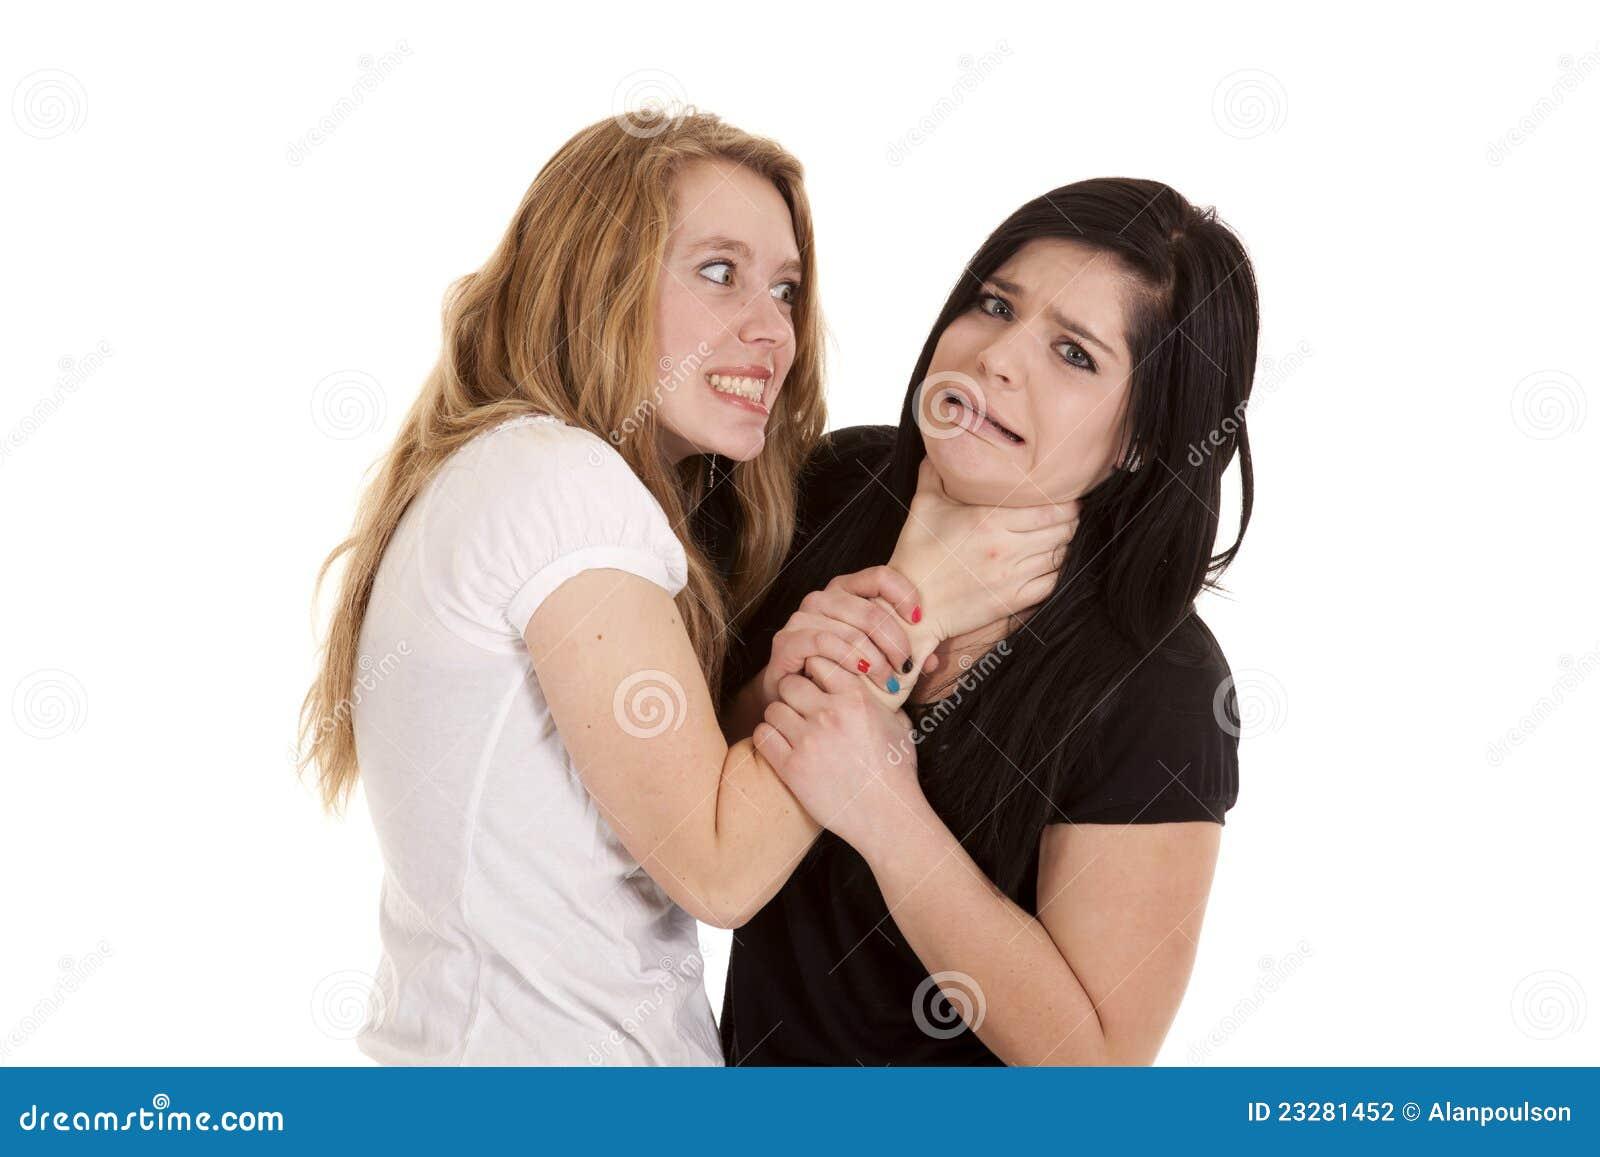 Teen girl chokes 2